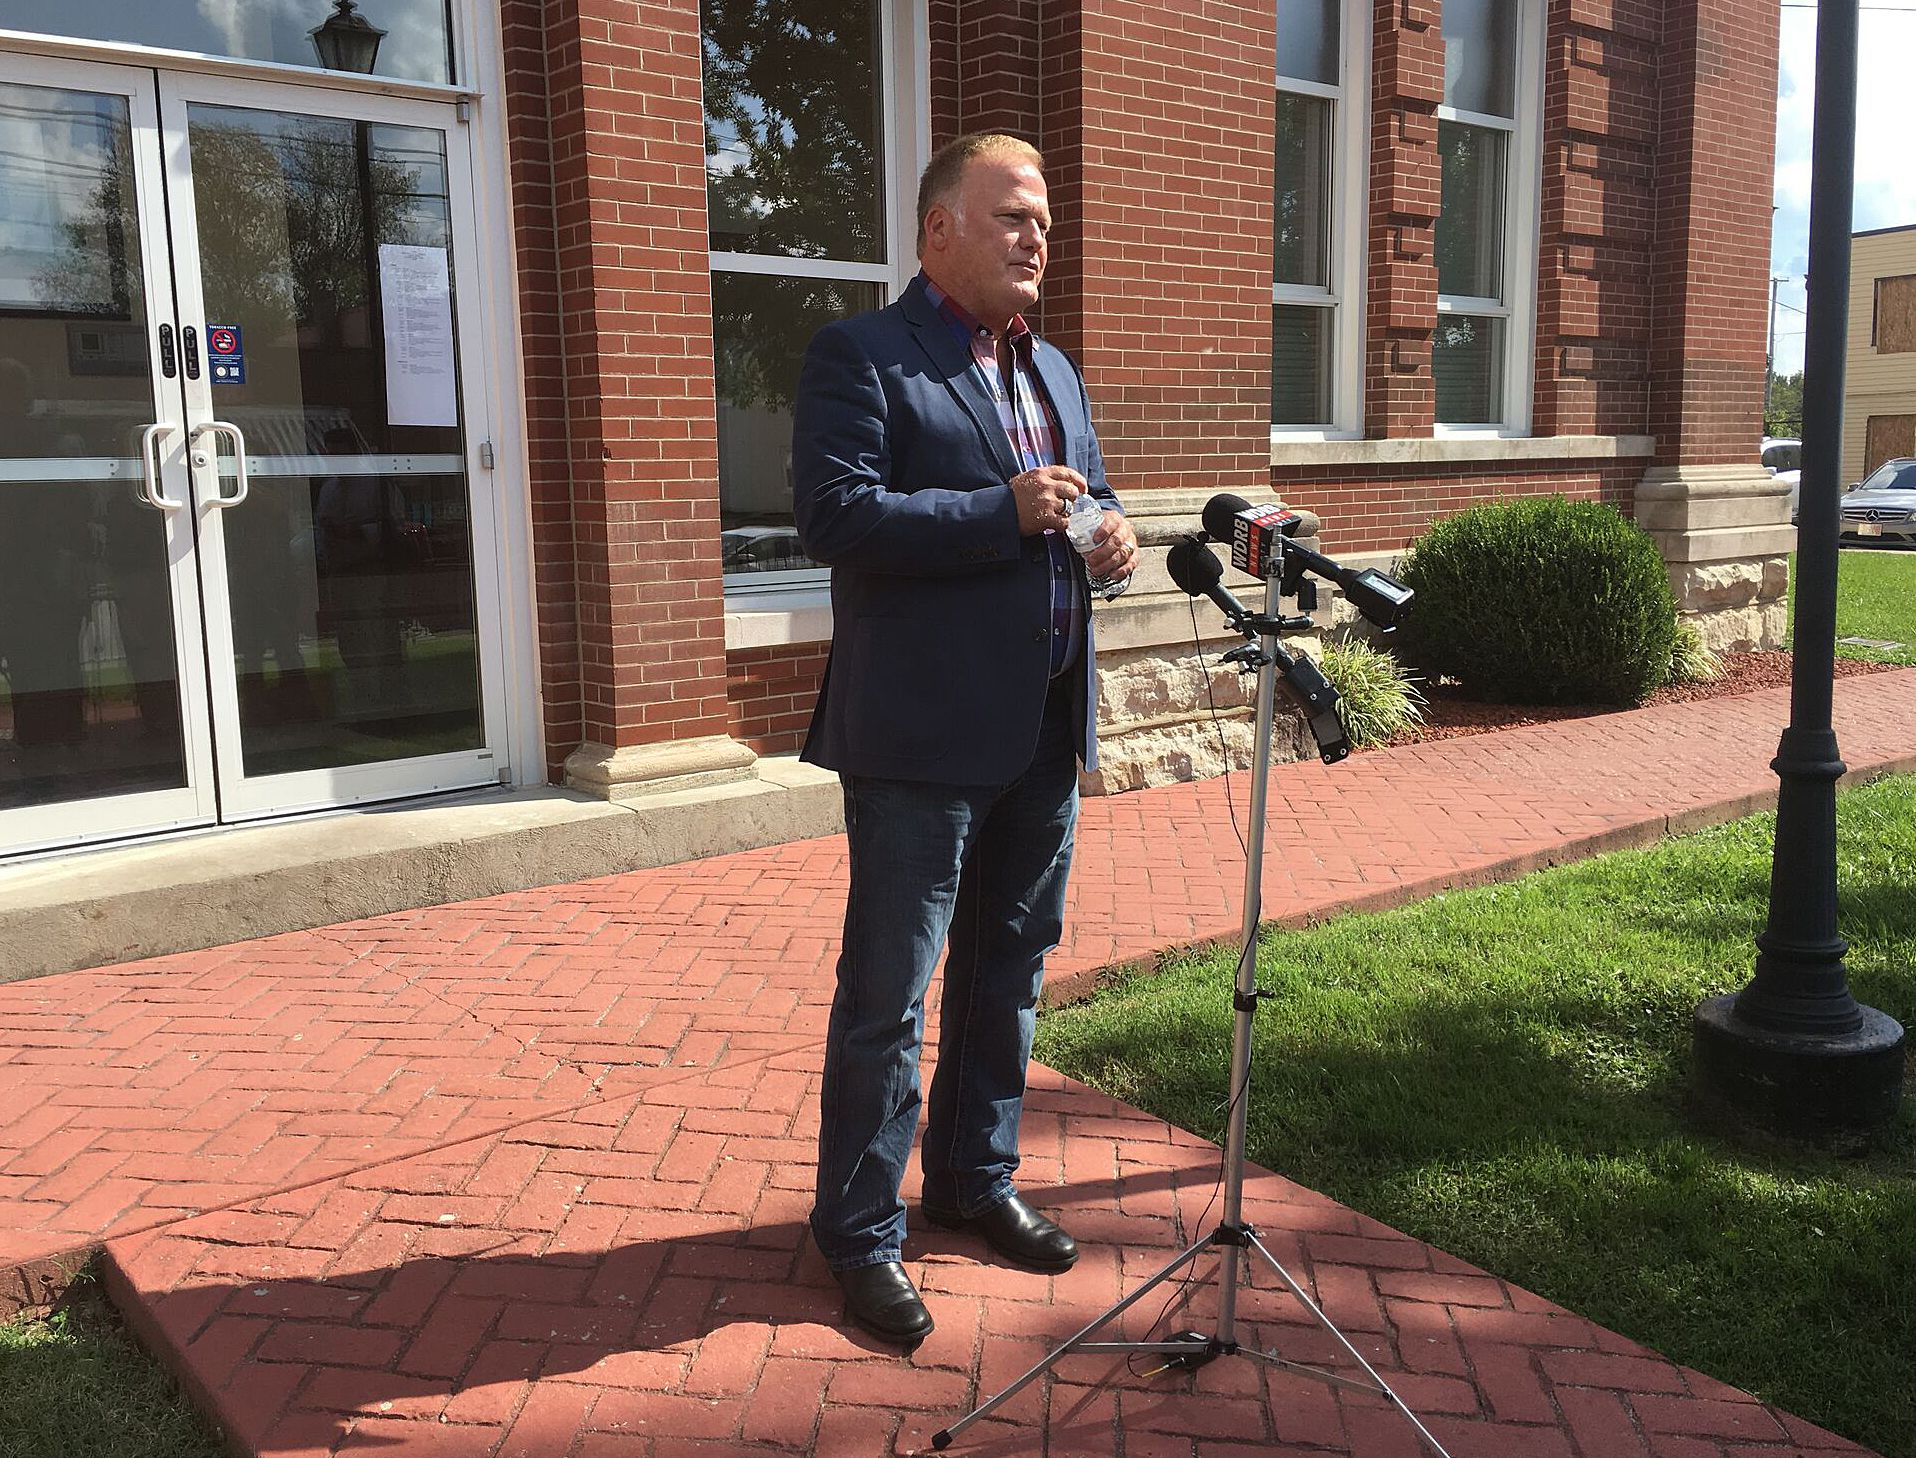 Kentucky state Rep. Dan Johnson speaks during a news conference outside the Bullitt County courthouse in Shepherdsville, Ky.